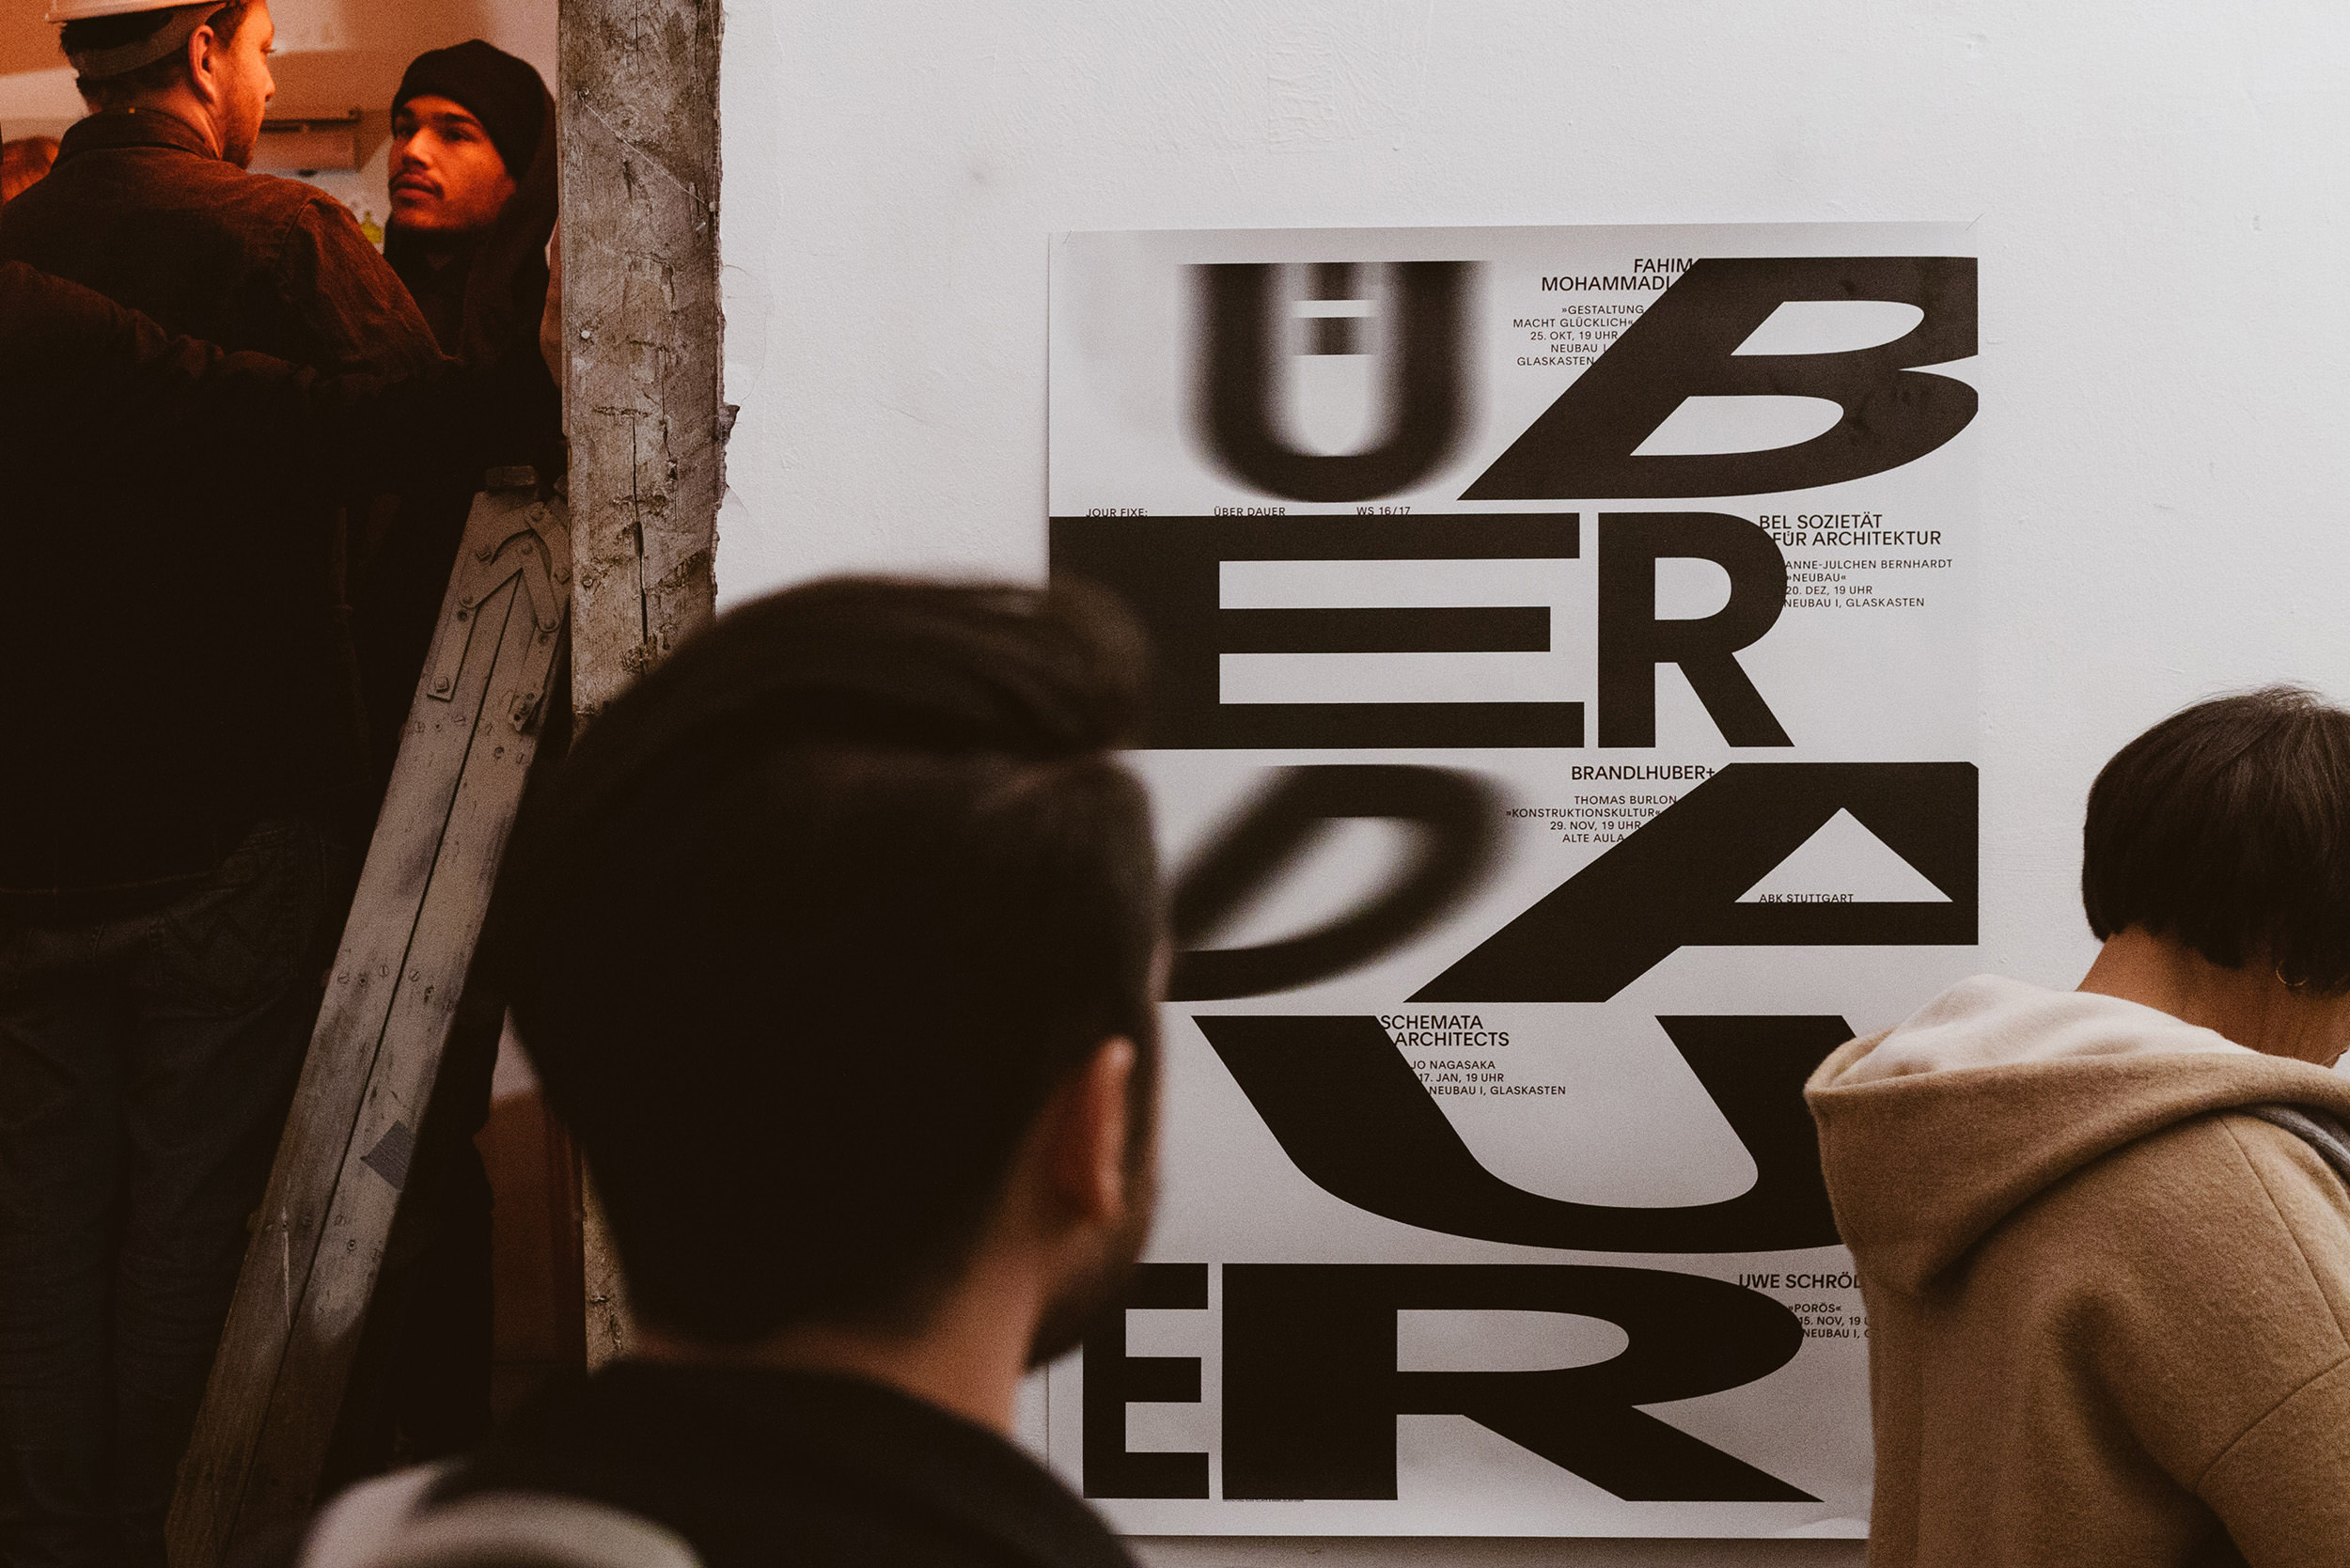 Abbildung des Plakats »Jour Fixe«, ausgestellt während des Rundumschlags 2017 in der Lotte, Stuttgart